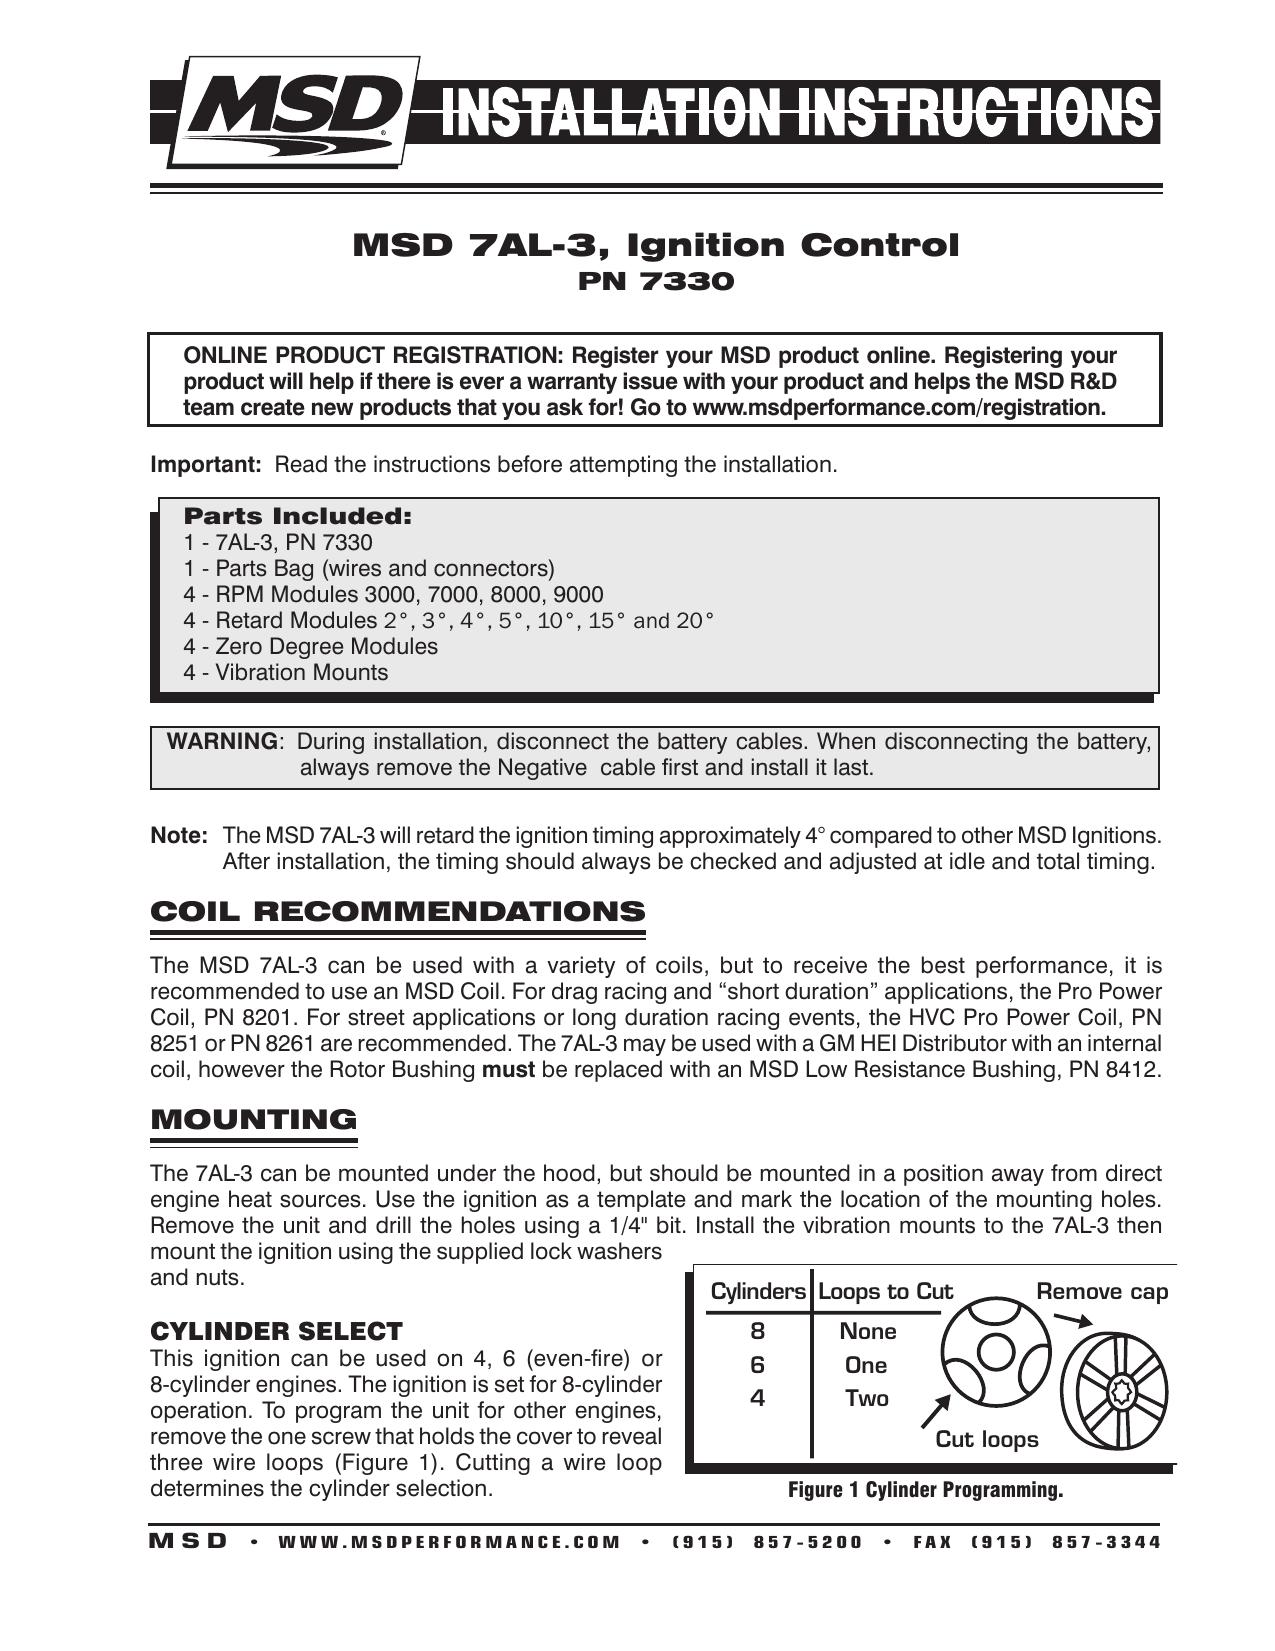 Msd 7al 3 Ignition Control Wiring For 2 Cylinder Engine